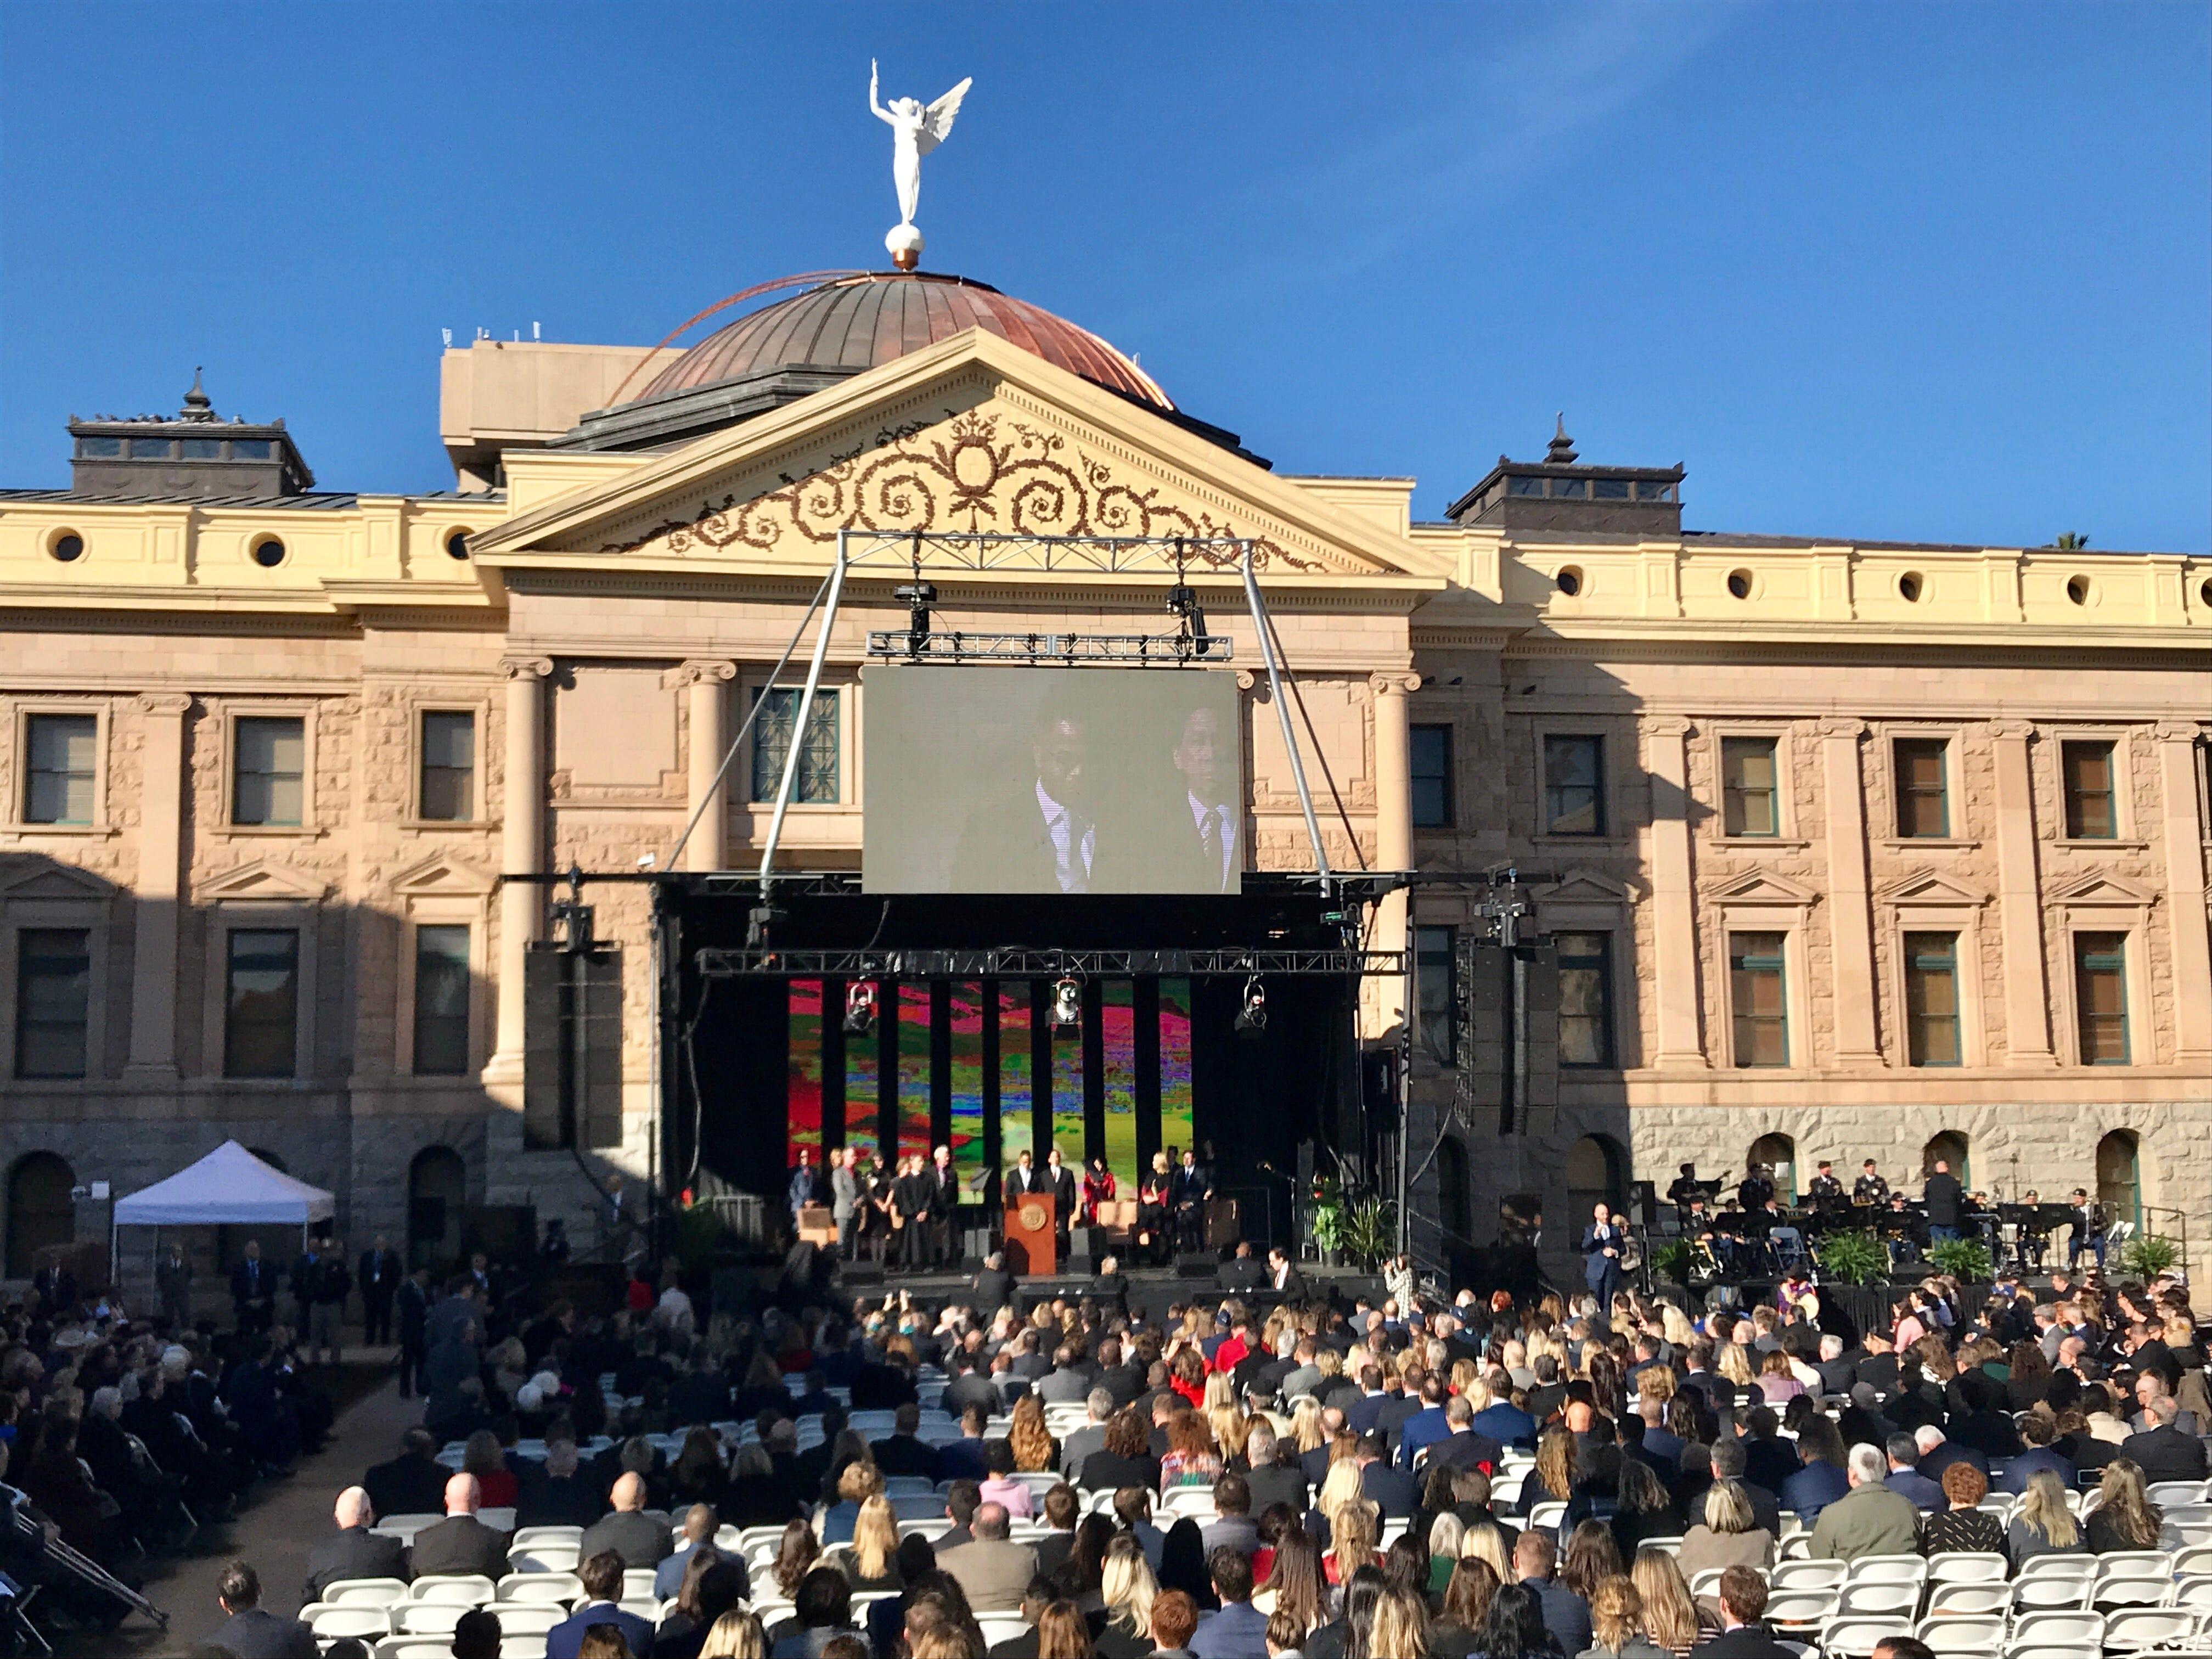 The inauguration ceremony at the Arizona Capitol in Phoenix, Jan. 7, 2019.